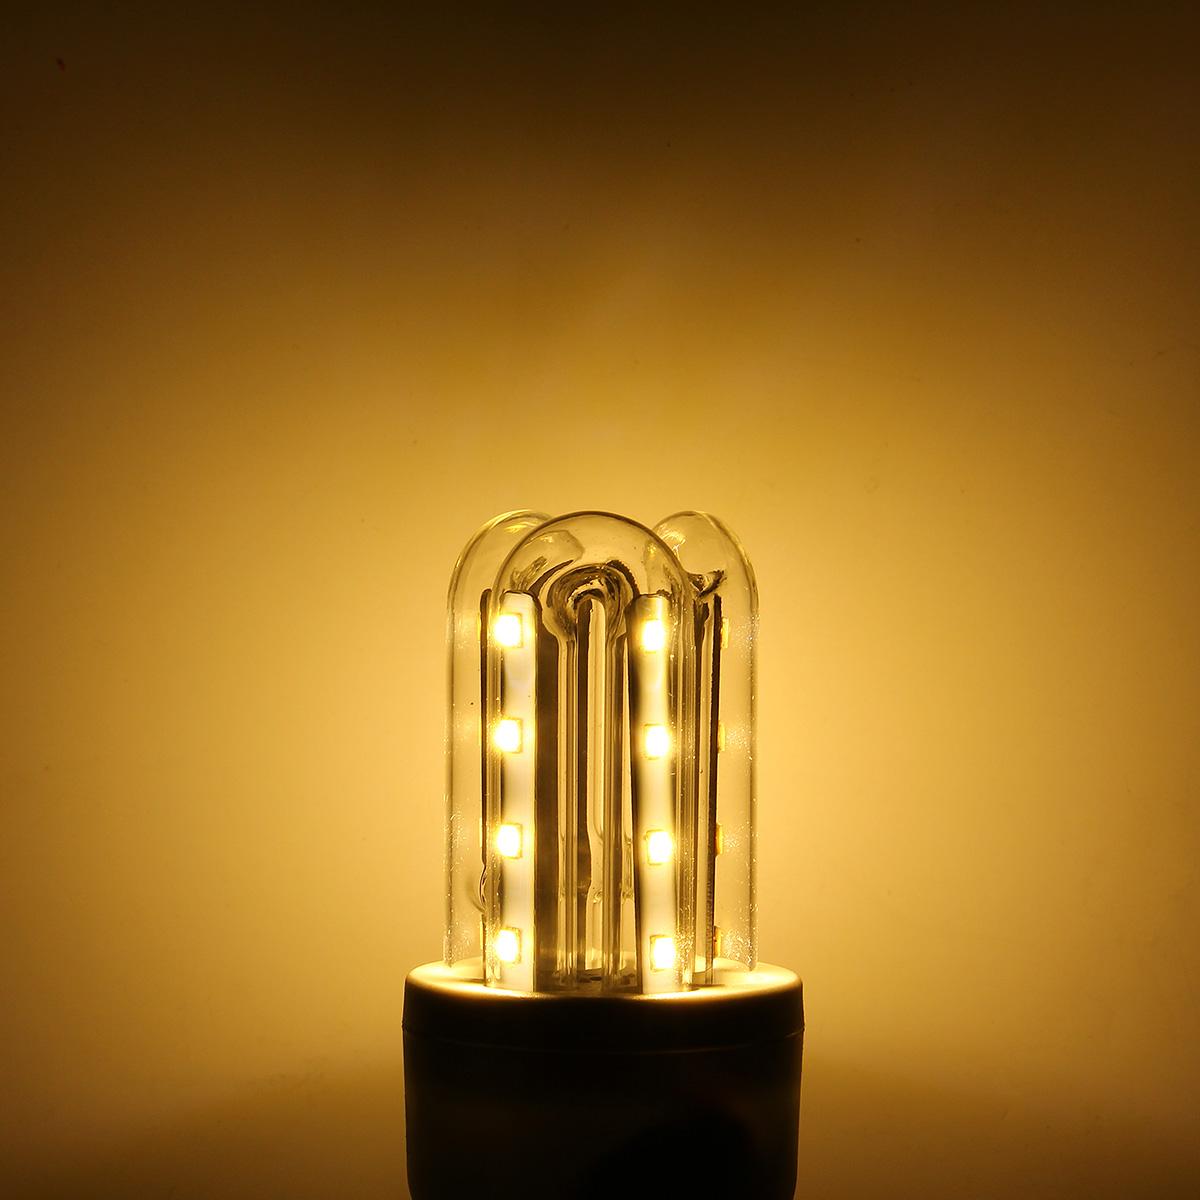 AC90-245V 3W-36W E27 LED Ultra Bright Energy Saving Warm White Light Bulb Lamp